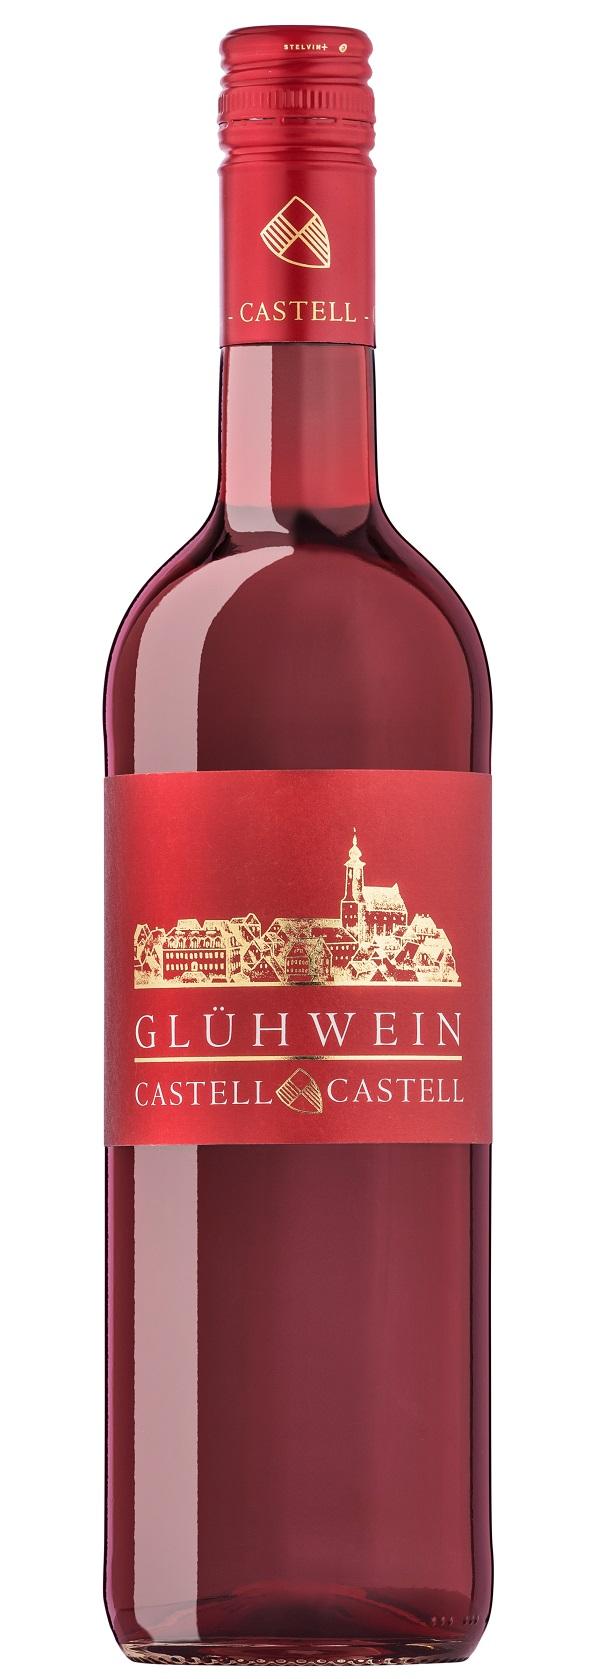 CASTELL-CASTELL GLÜHWEIN rot 2020